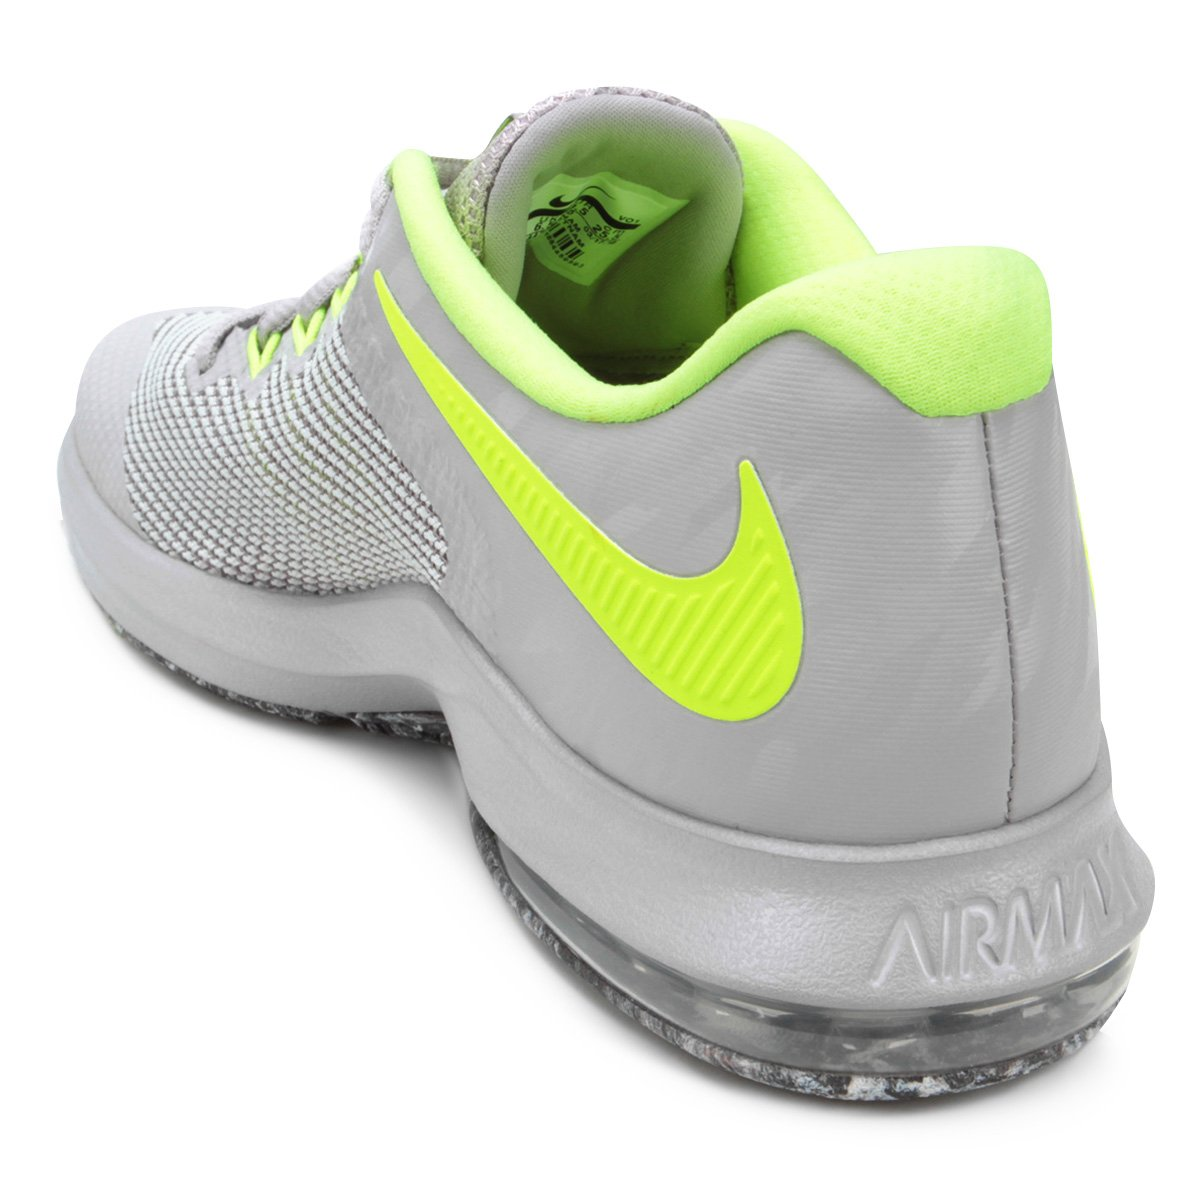 buy popular e3c05 e7464 ... Foto 2 - Tênis Nike Air Max Alpha Trainer Masculino ...